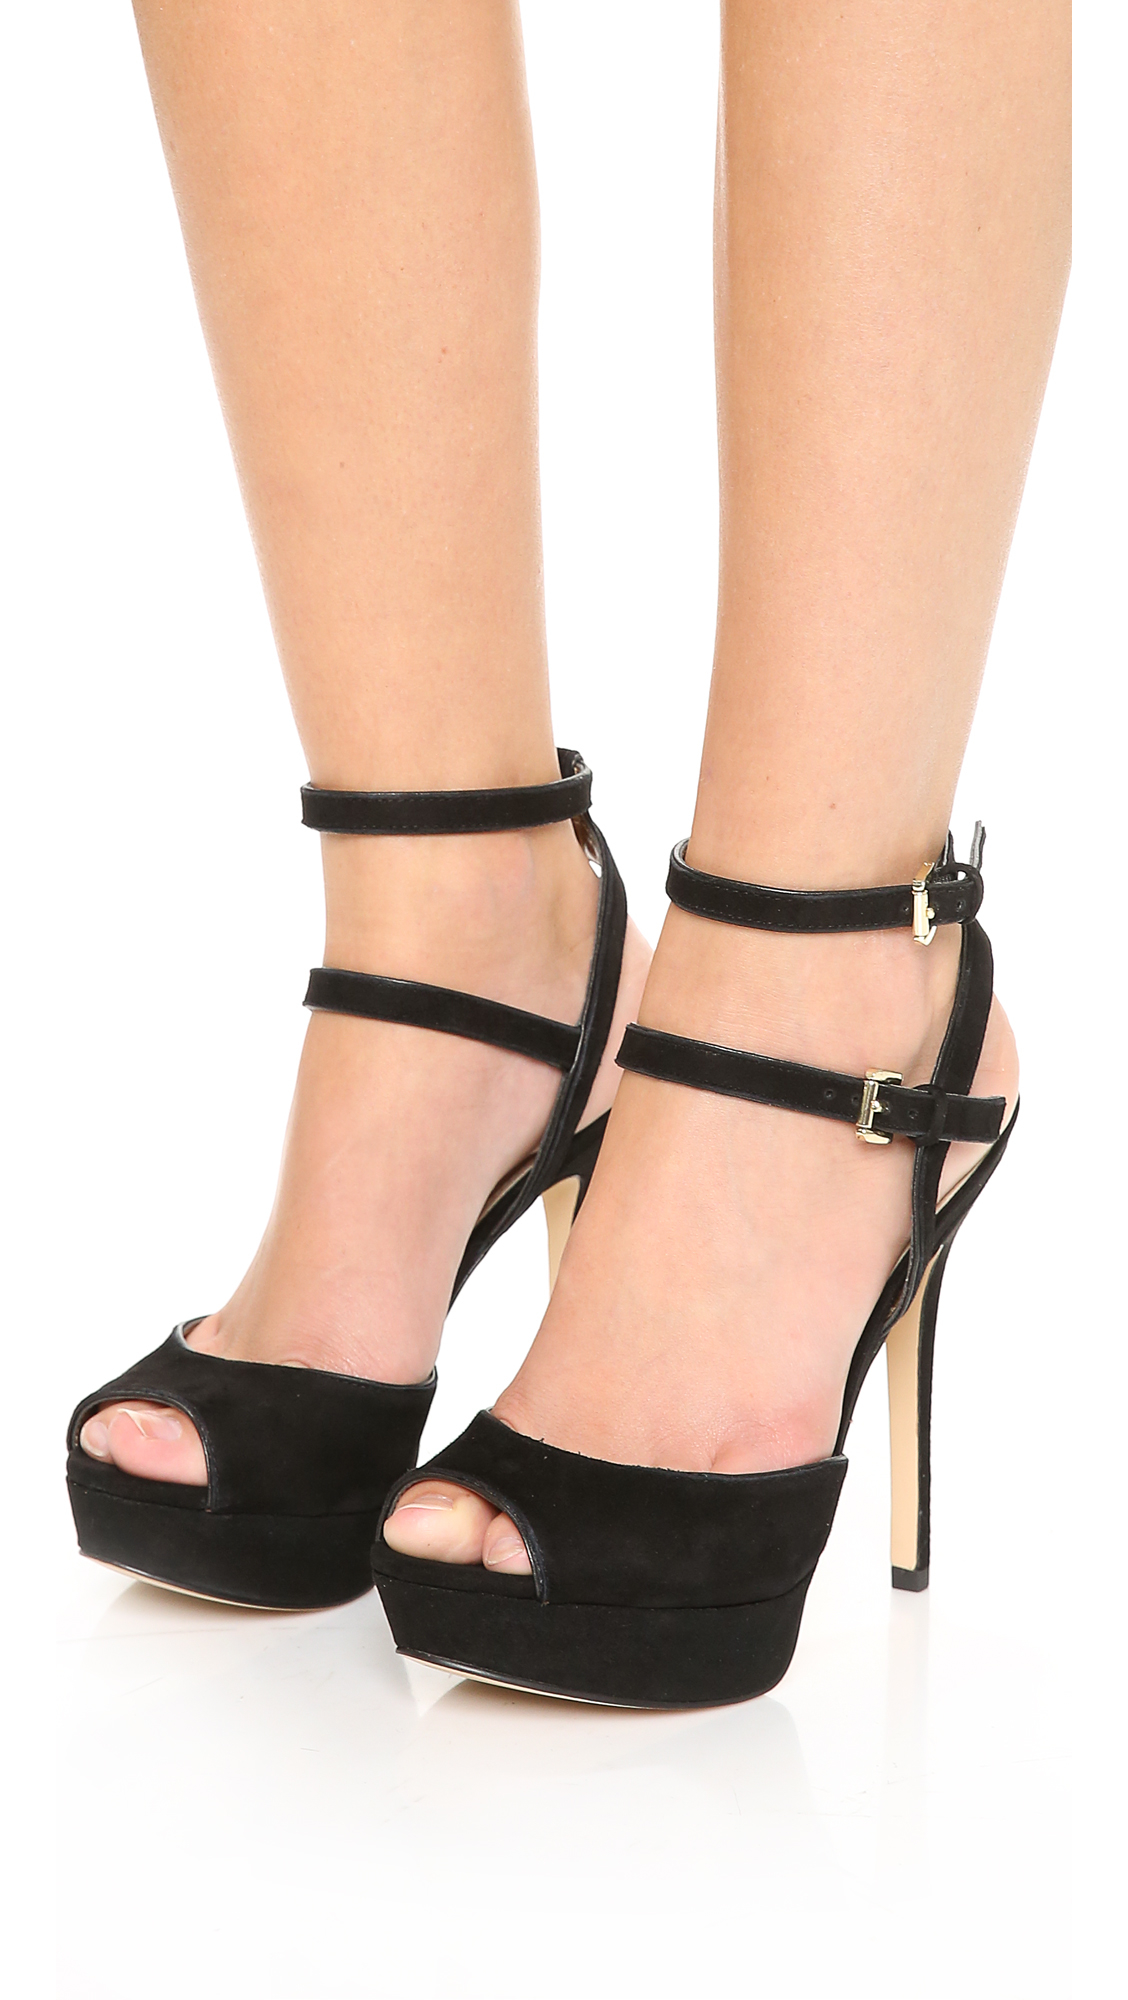 83a32868ff21 Lyst - Sam Edelman Nadine Suede Platform Sandals - Black in Black